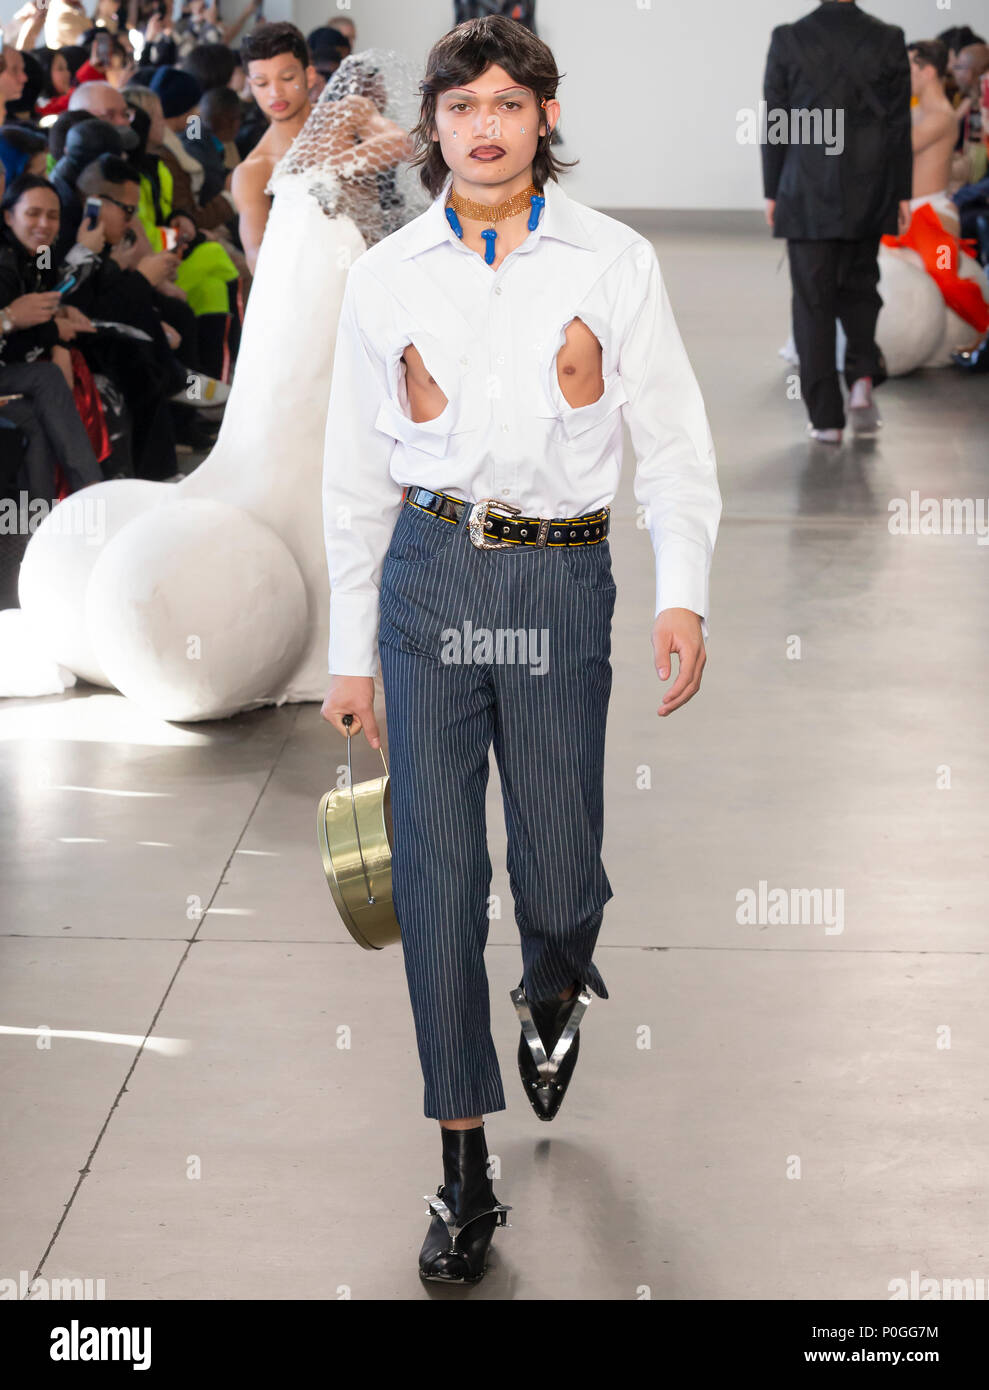 NEW YORK, NY - Feb 05, 2018: A model walks the runway at the